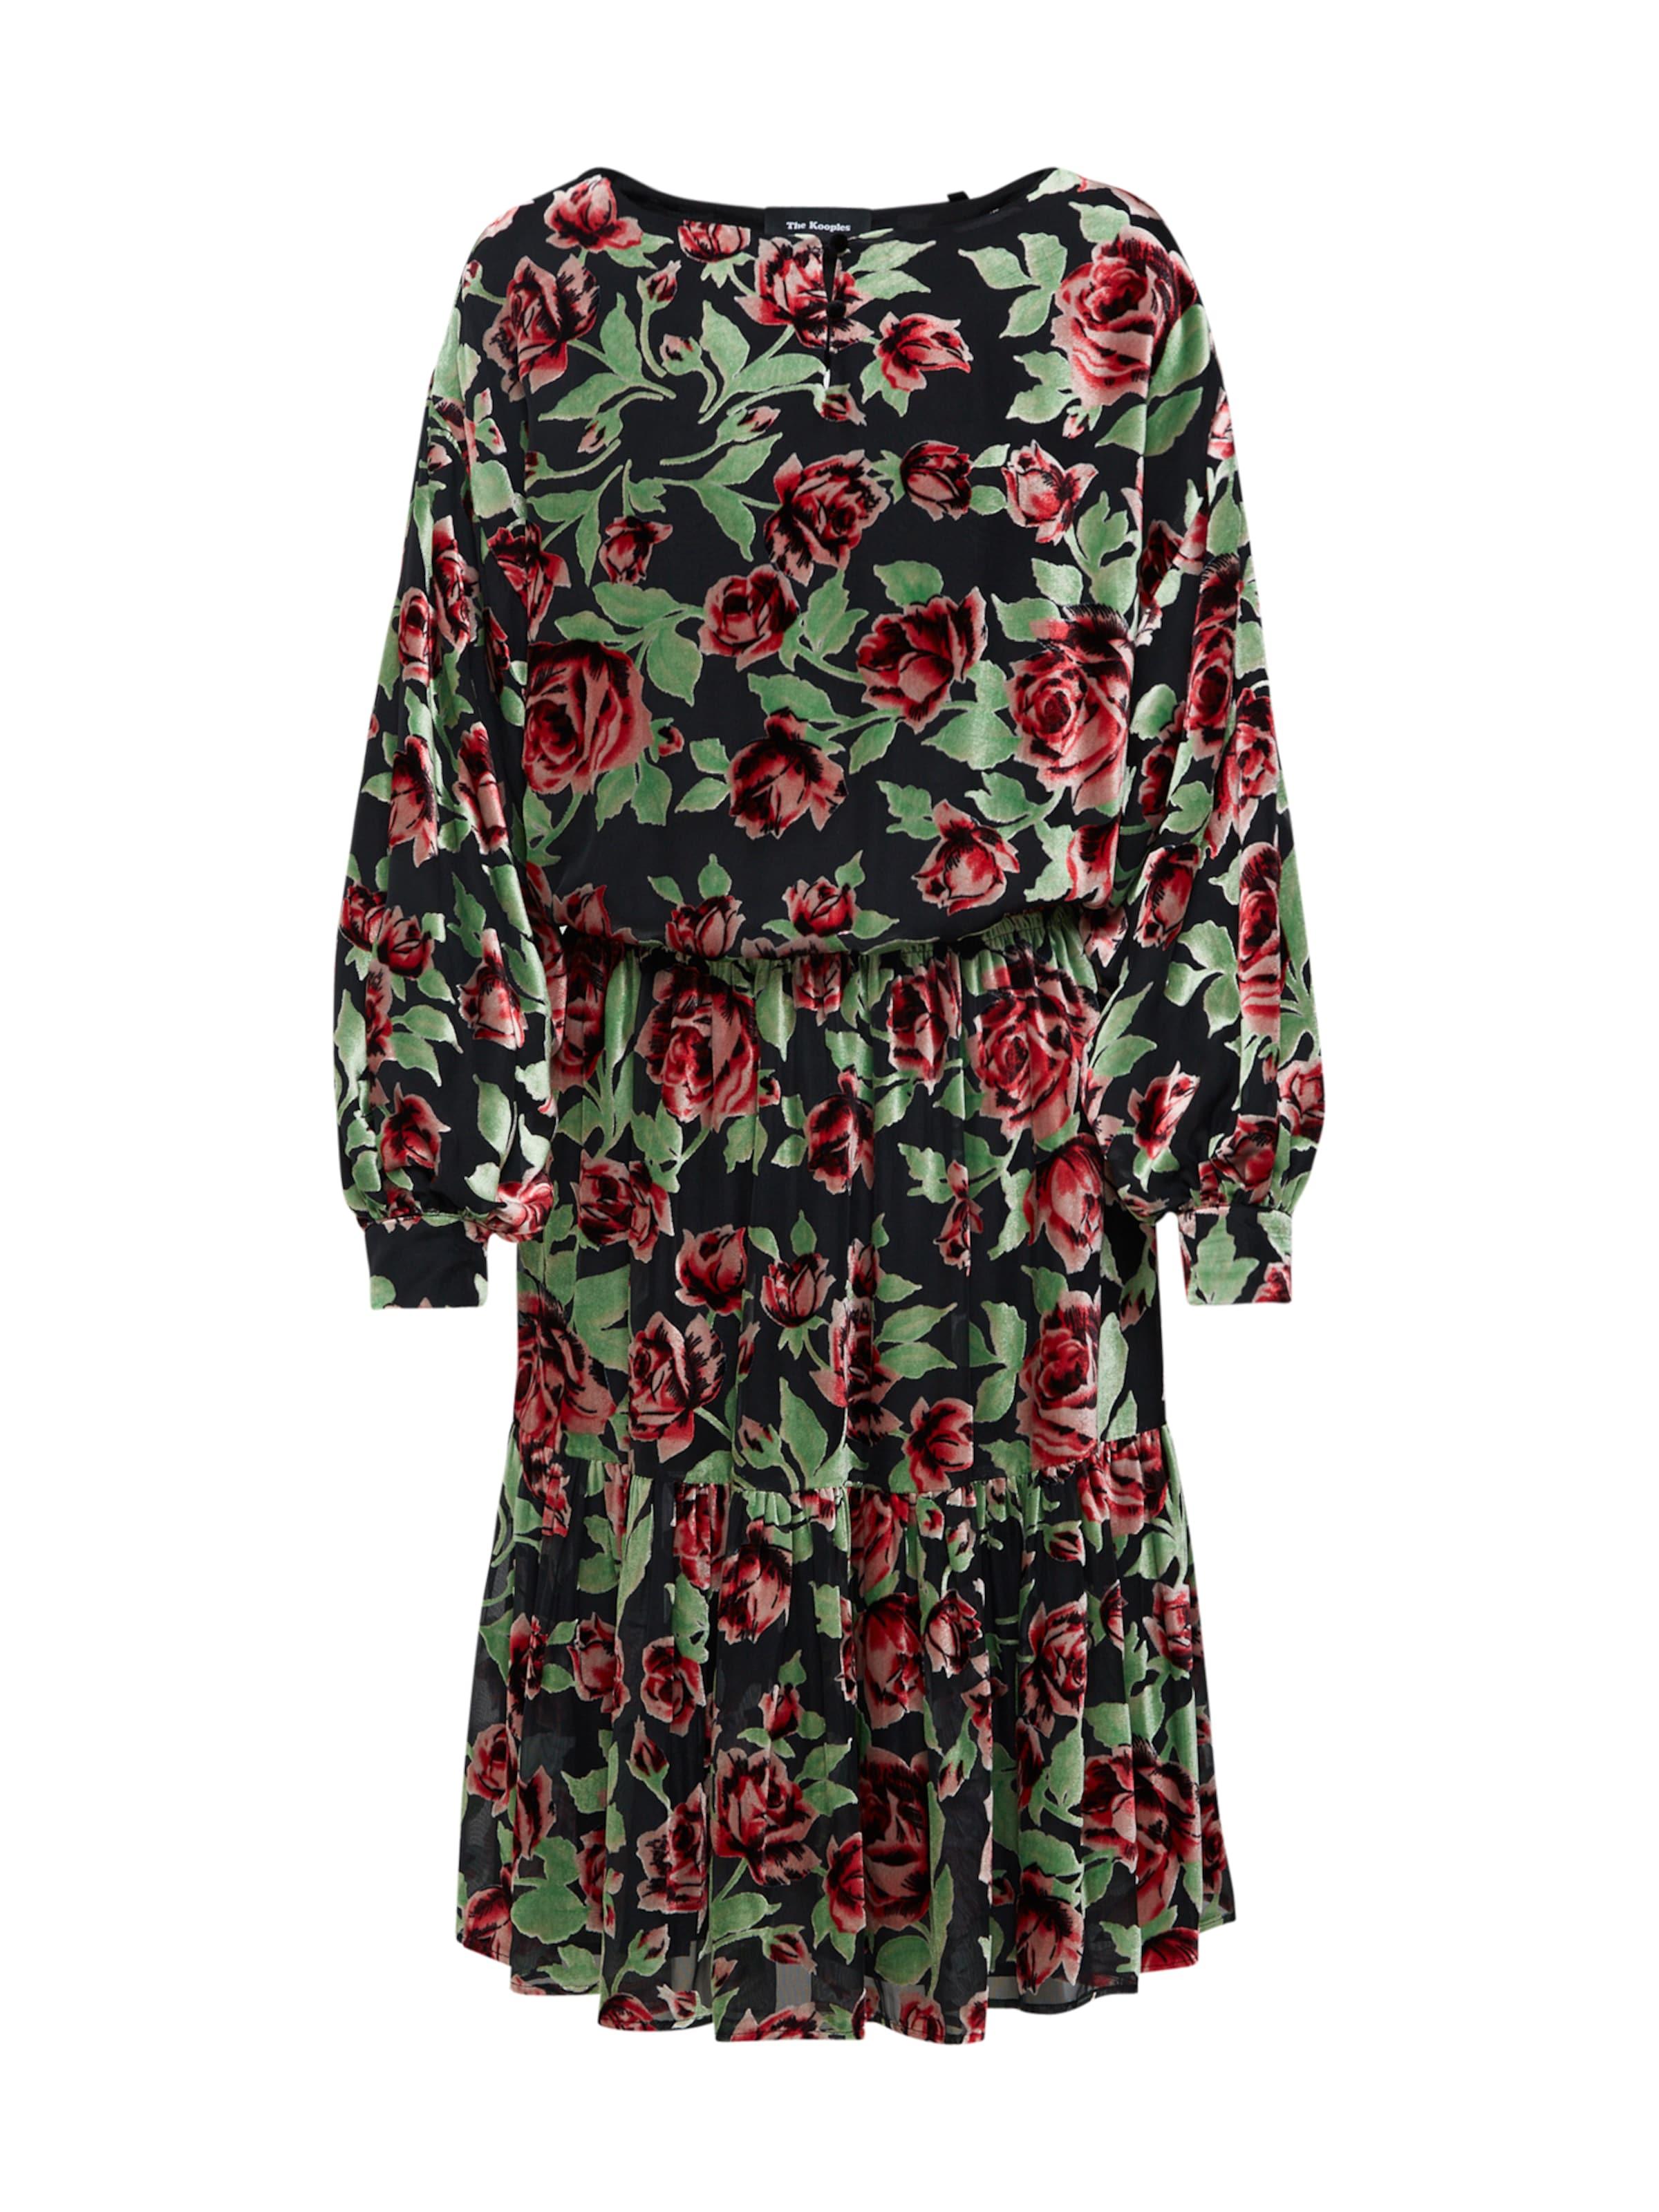 ClairRouge Carmin The Kooples Robe En Vert UVSMzpLqGj